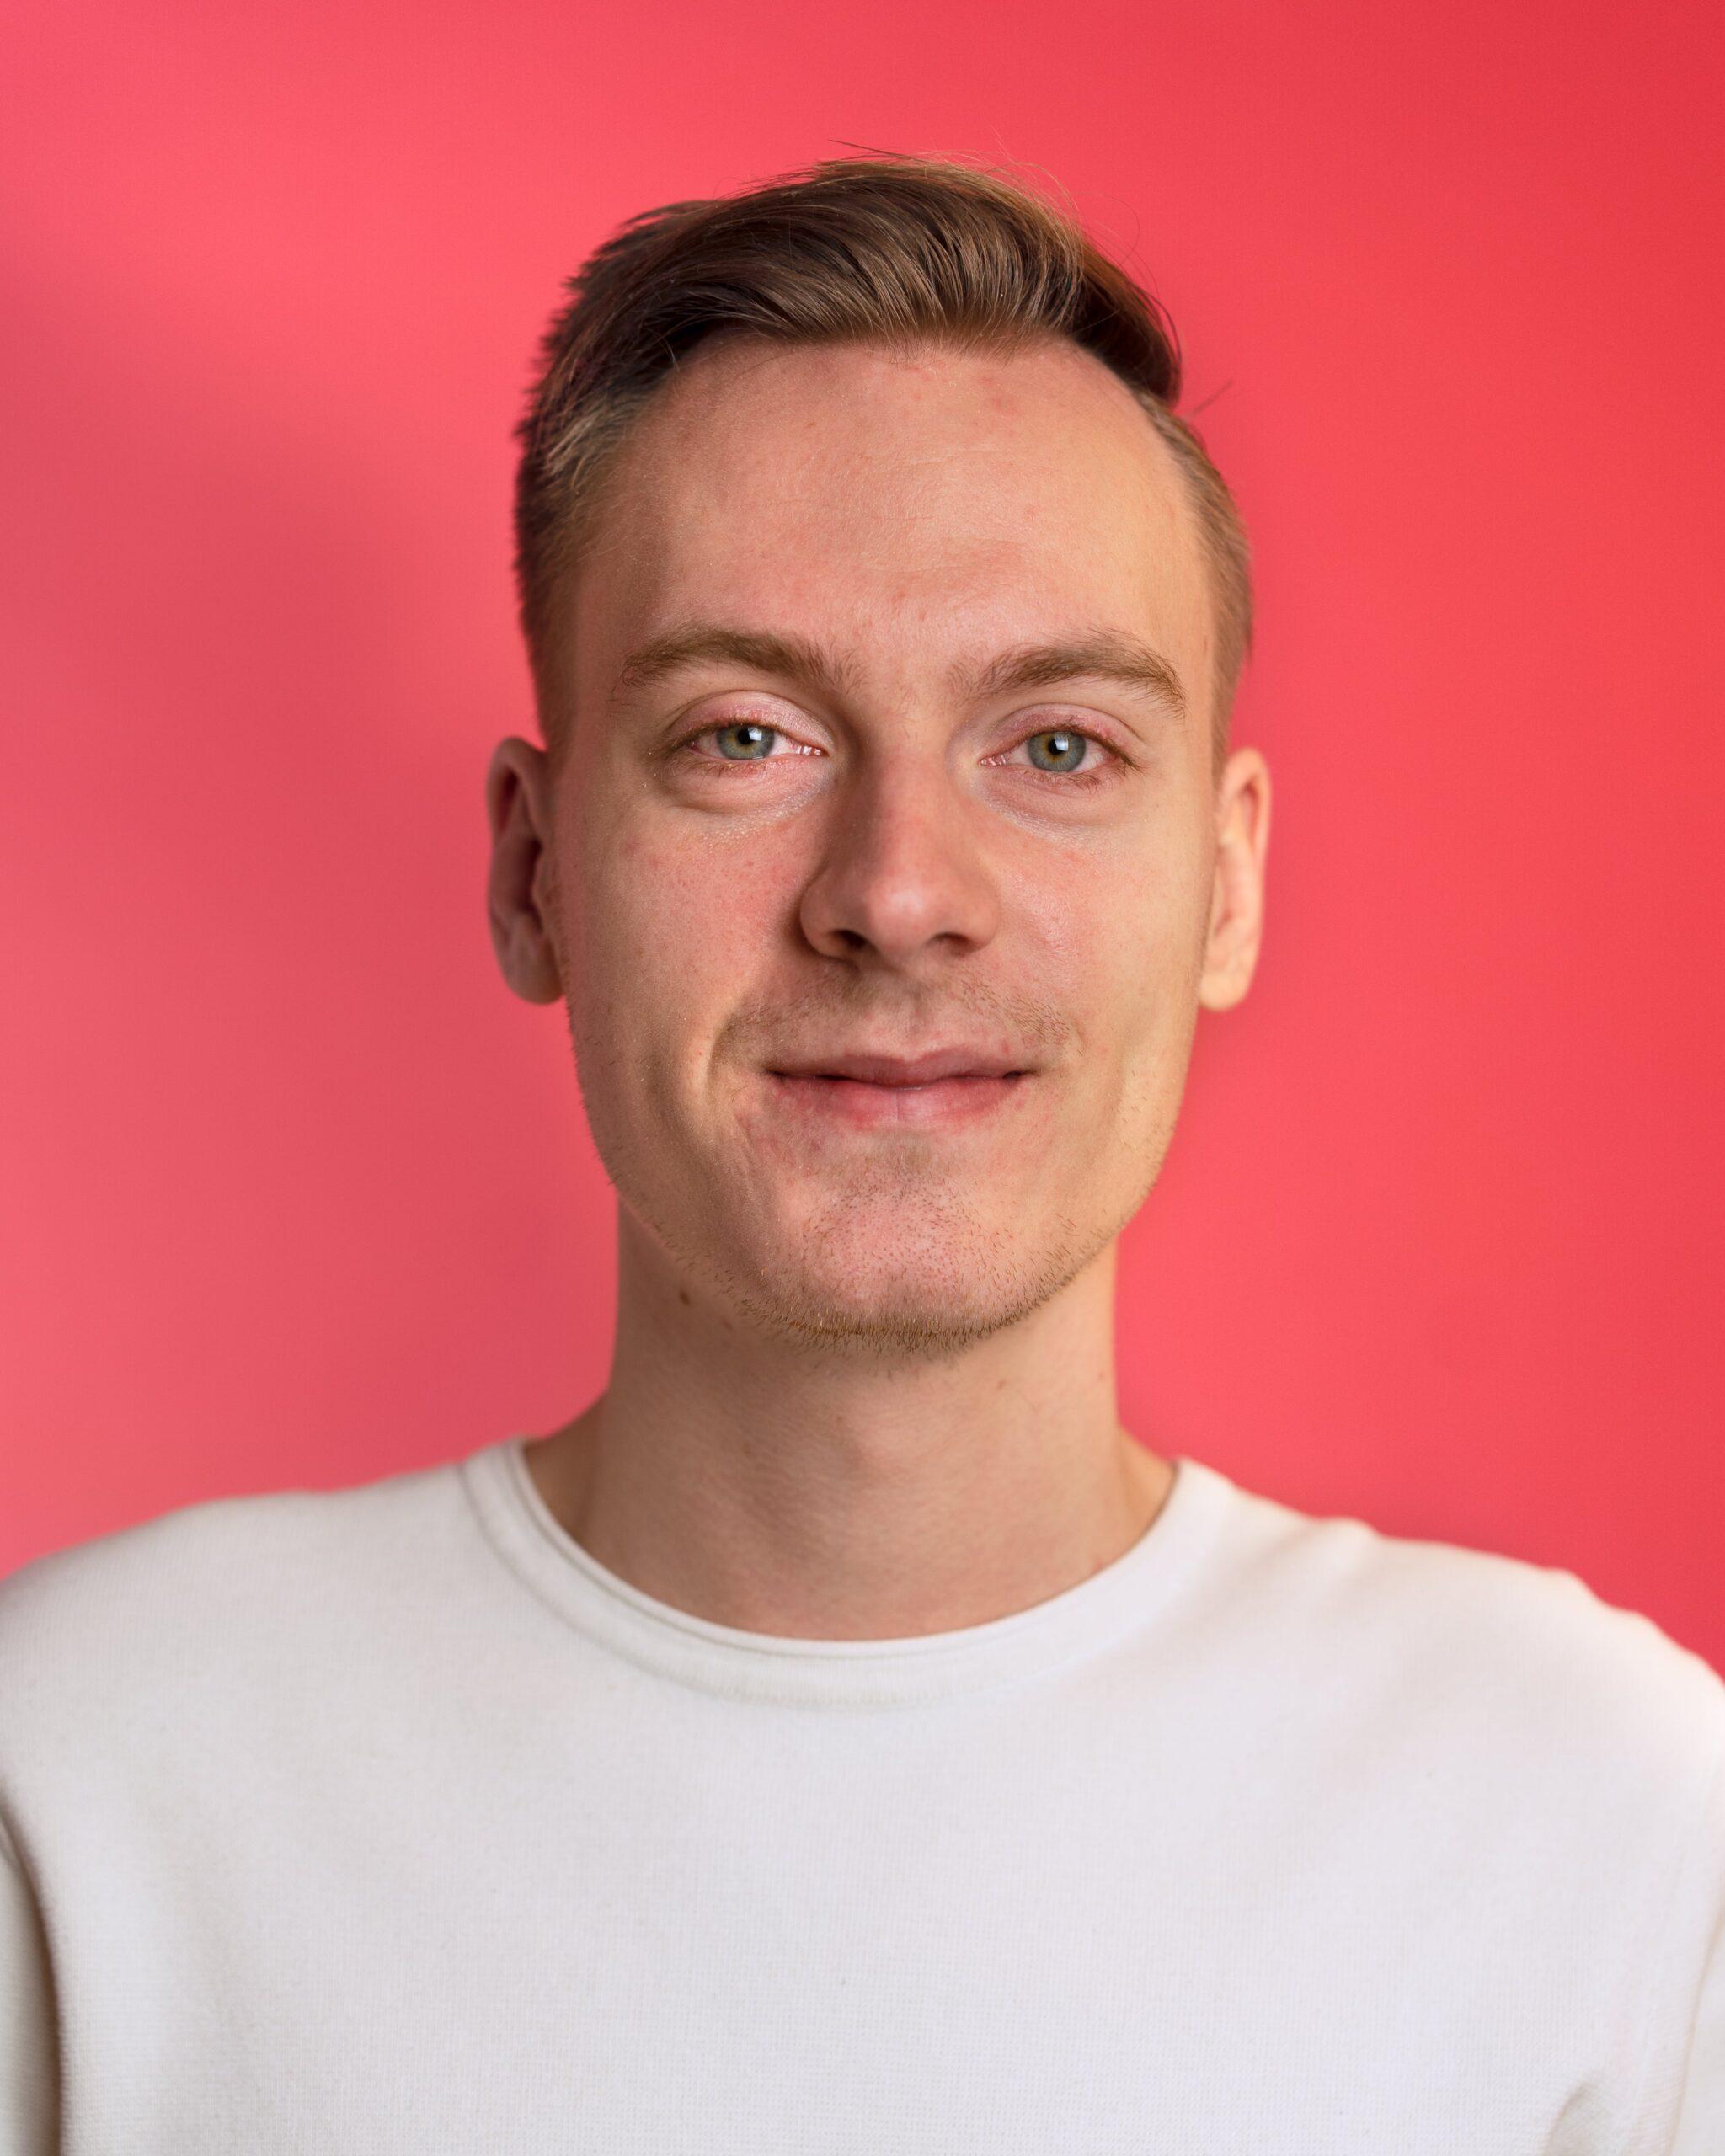 Mikkel Rohde